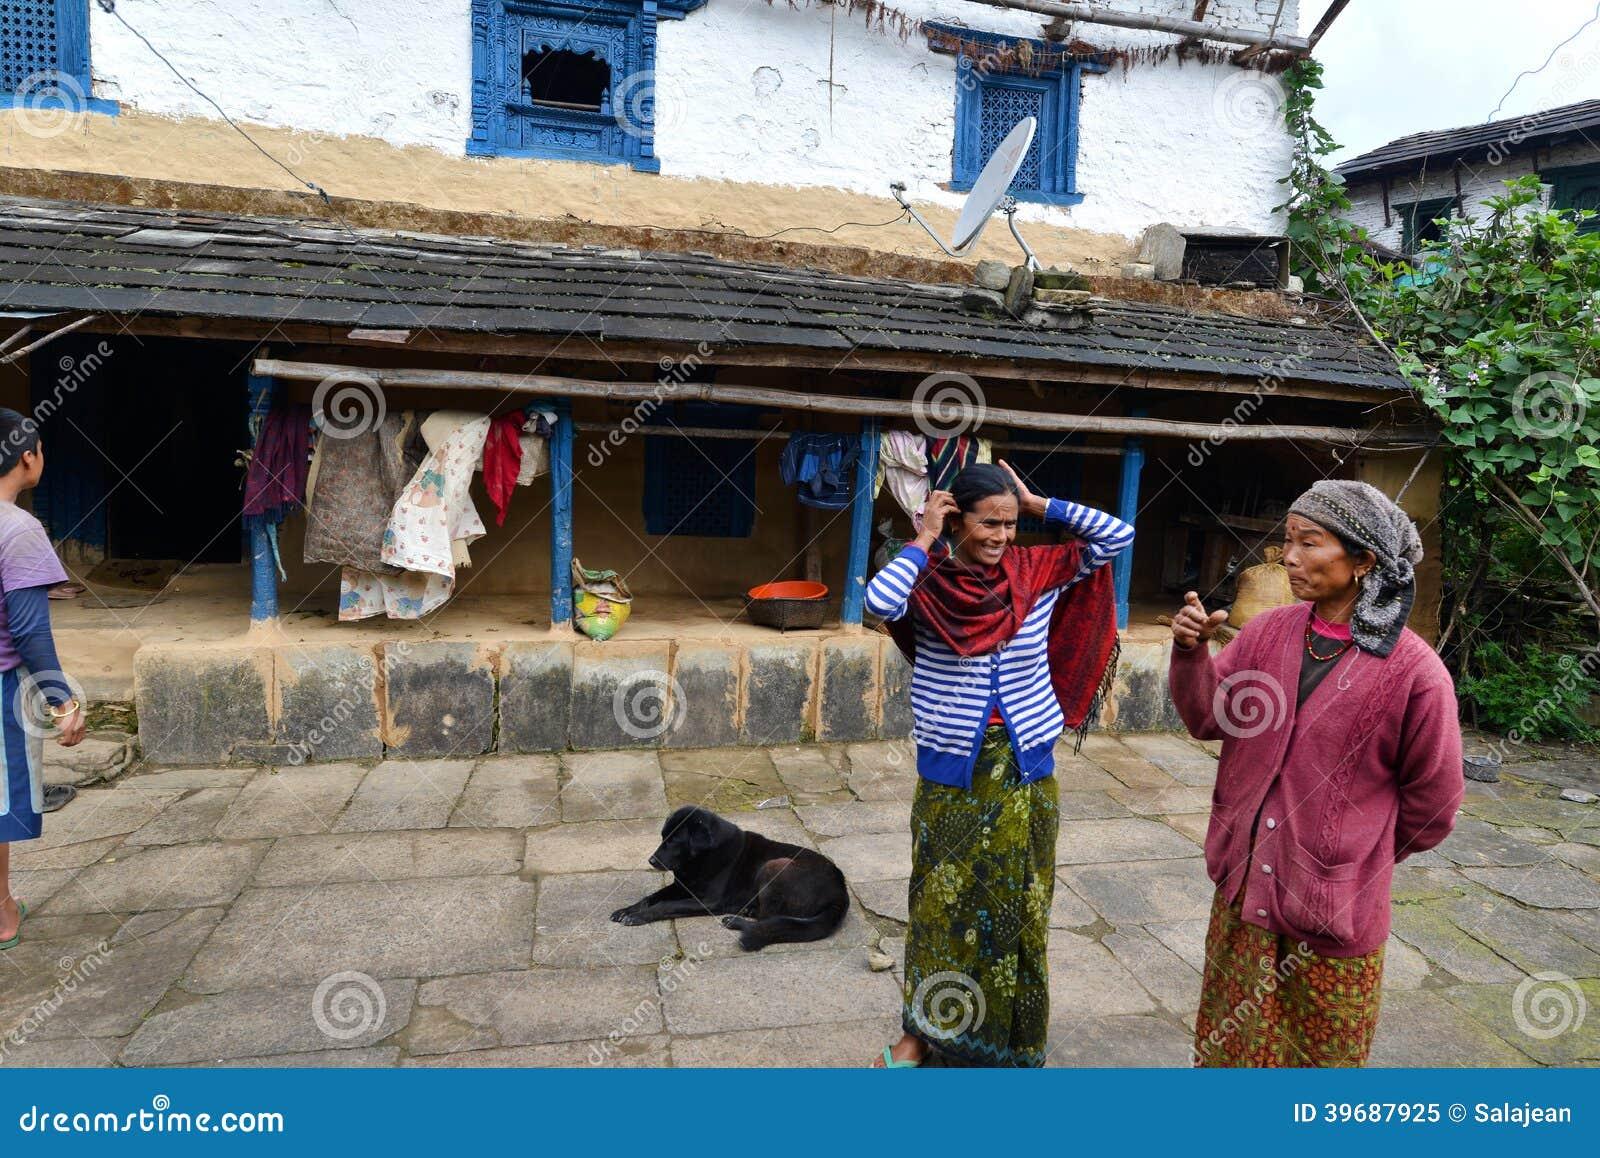 Villaggio tradizionale di Gurung di Ghandruk in Himalaya